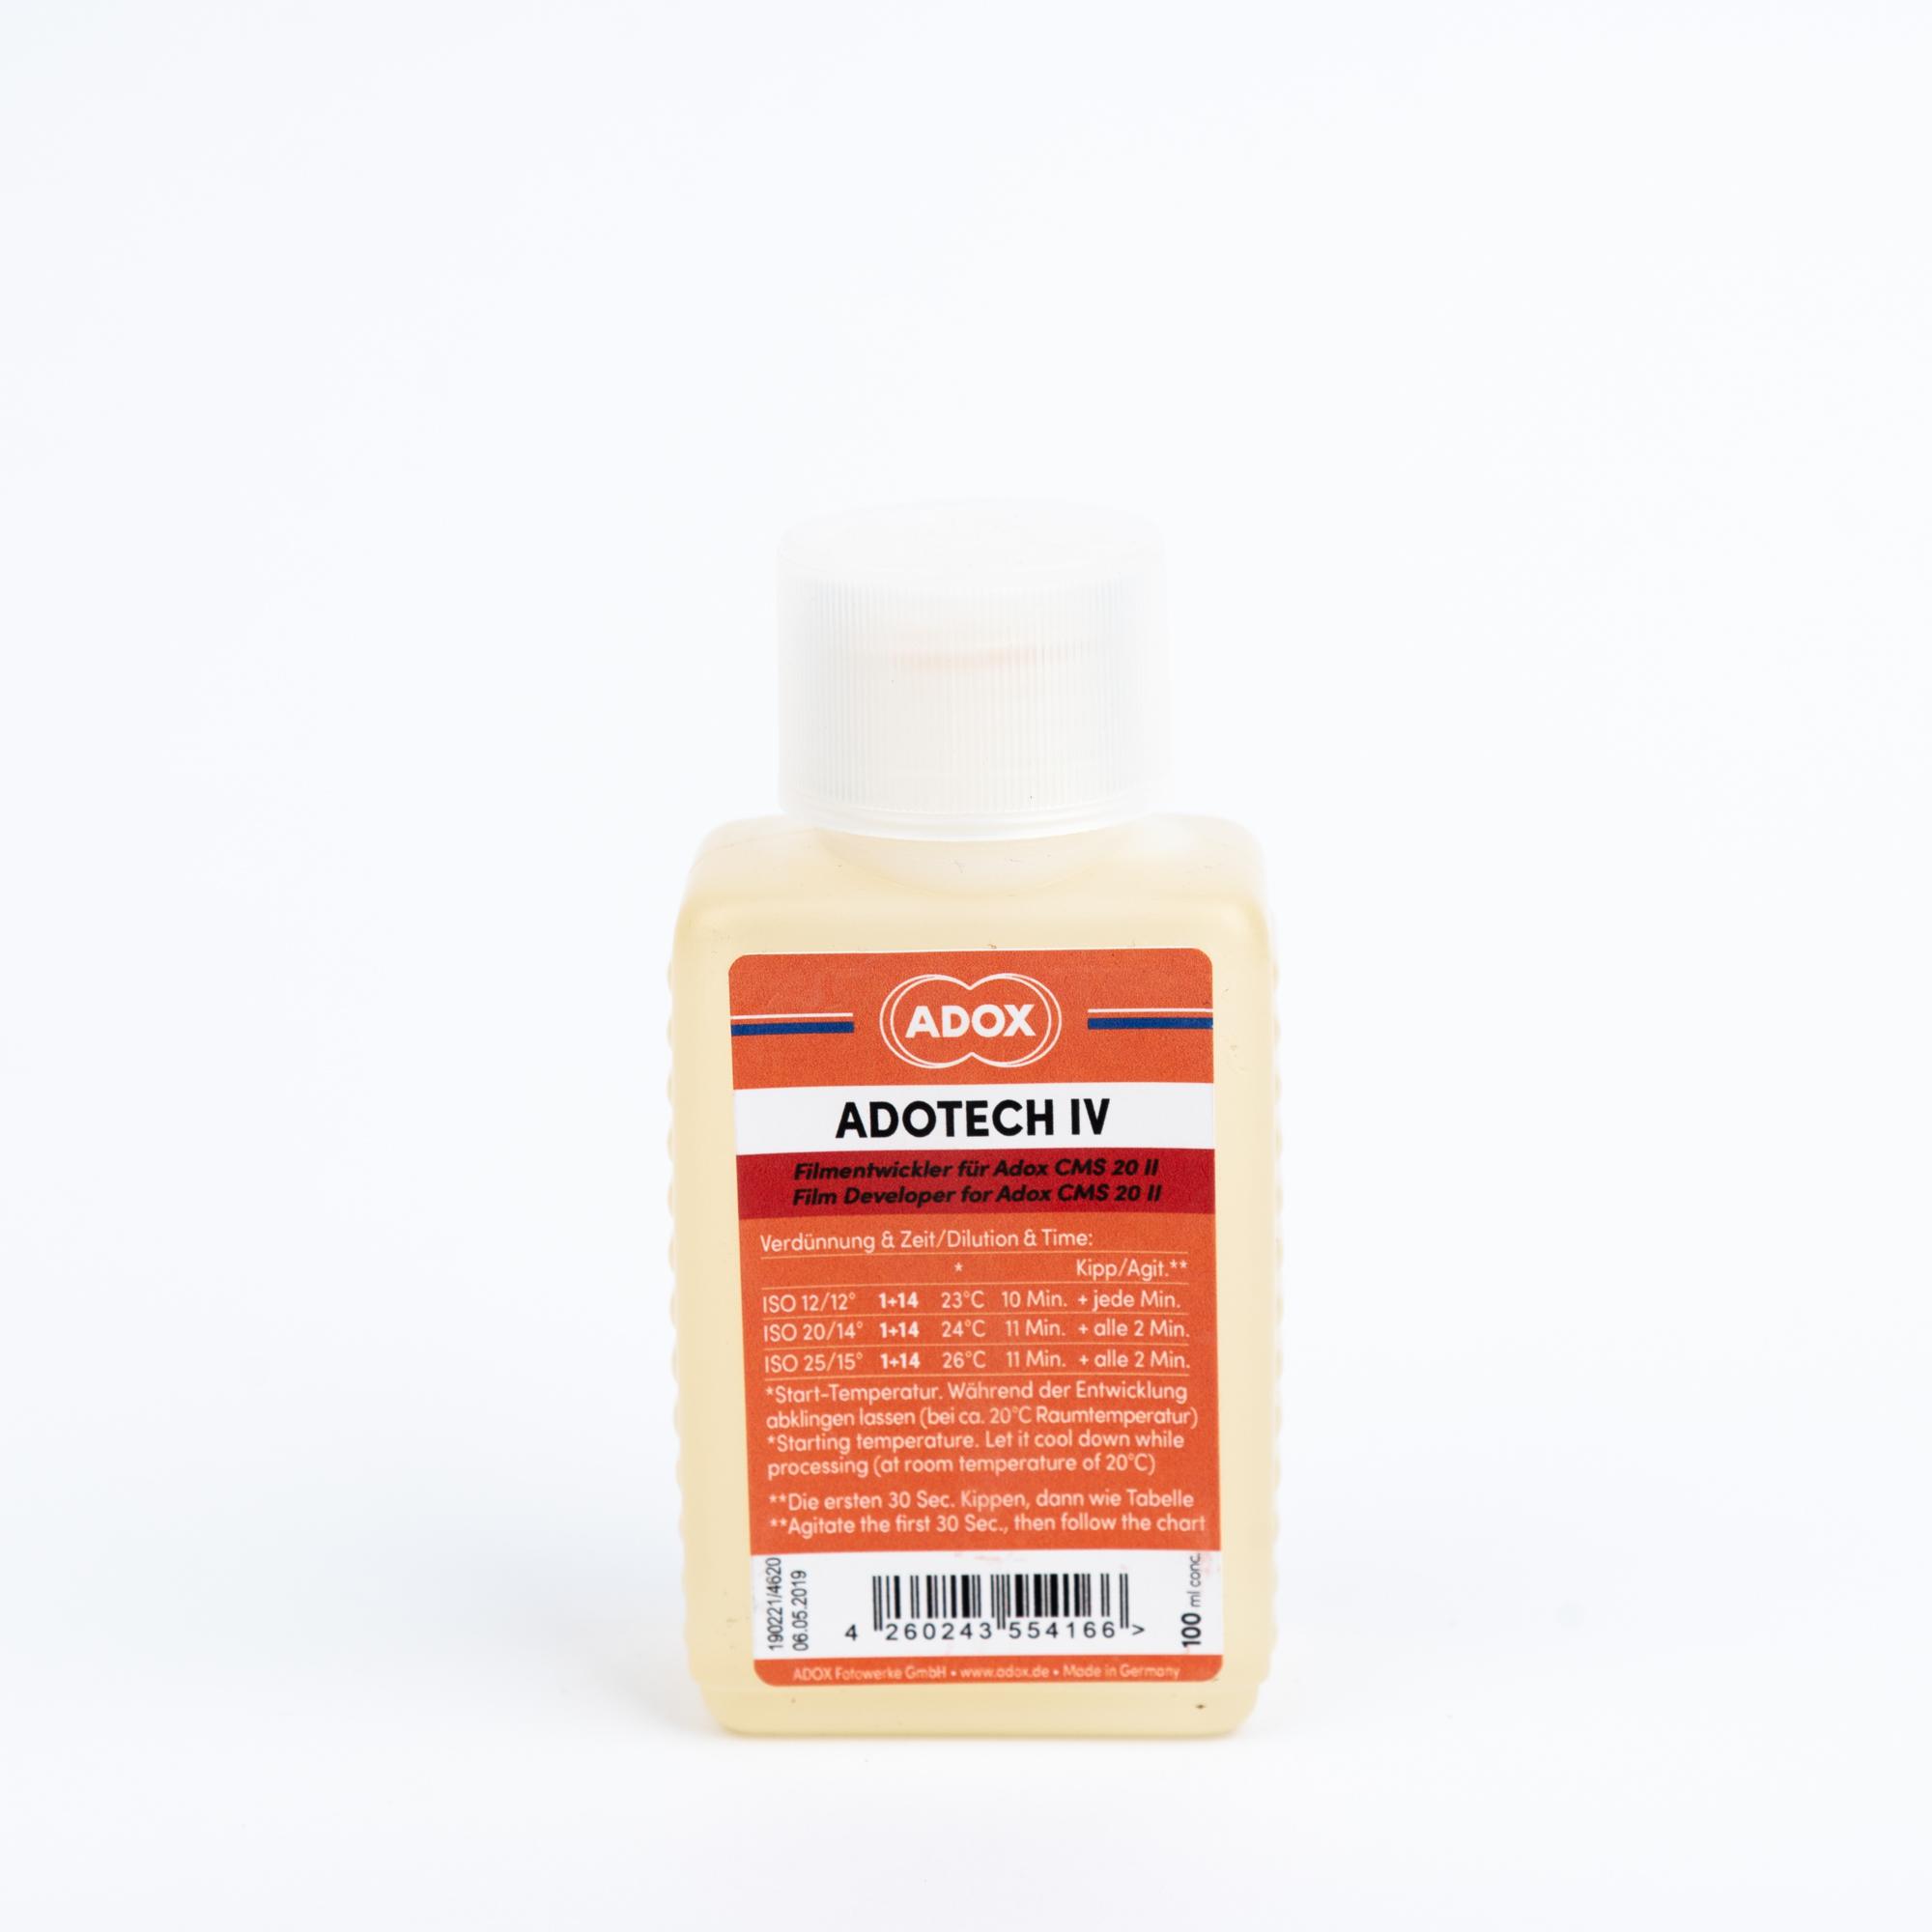 Проявитель ADOX Adotech IV 100ml (концентрат)